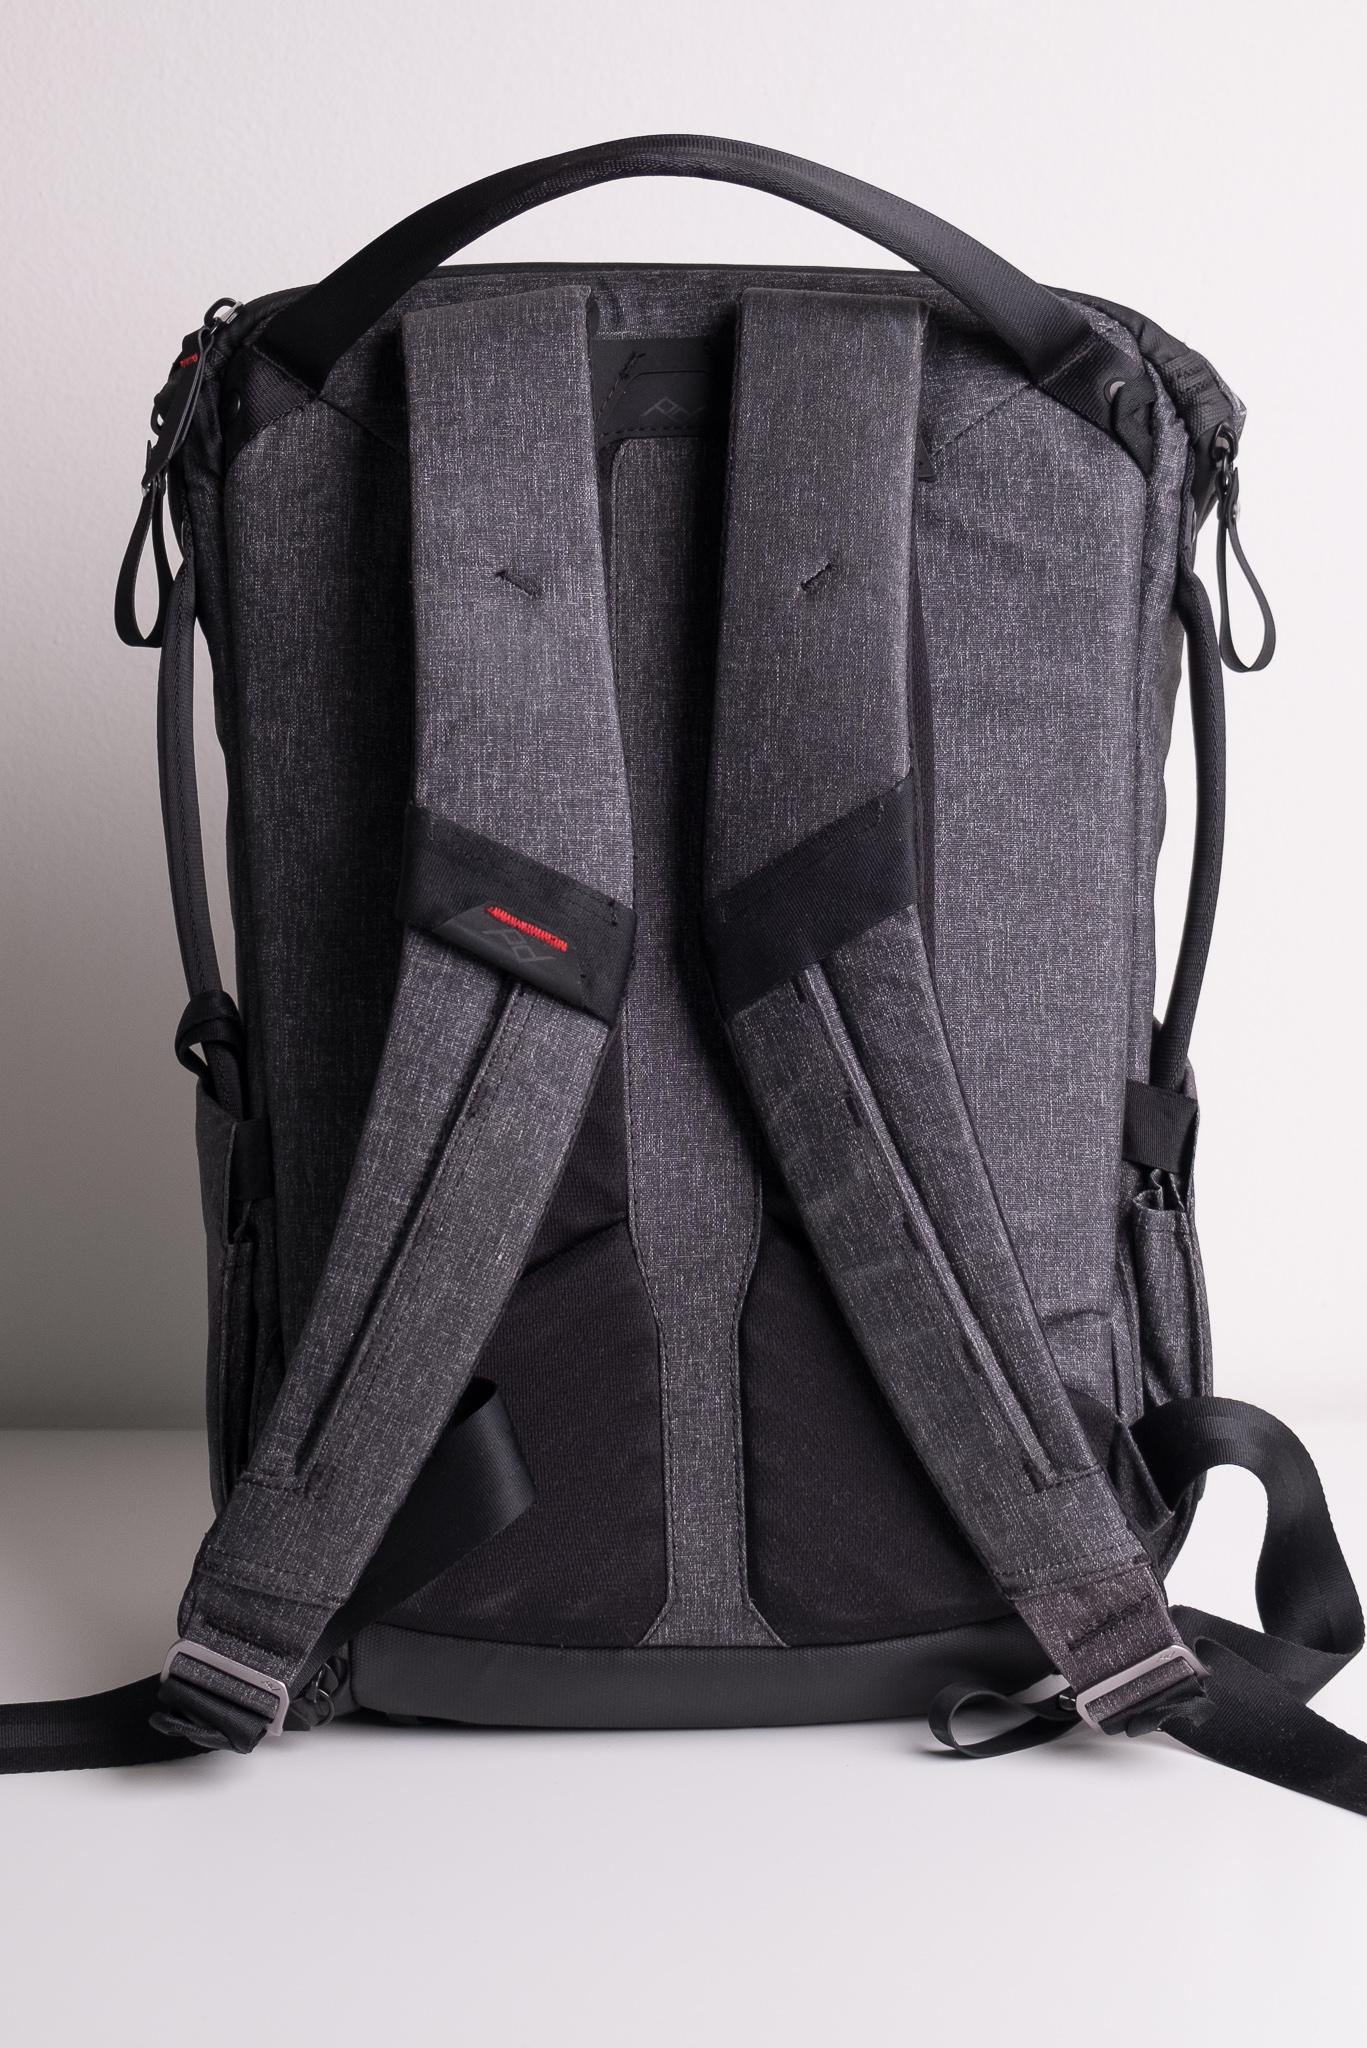 164f2c89f1 Recenze batohu Peak Design Everyday Backpack 20l